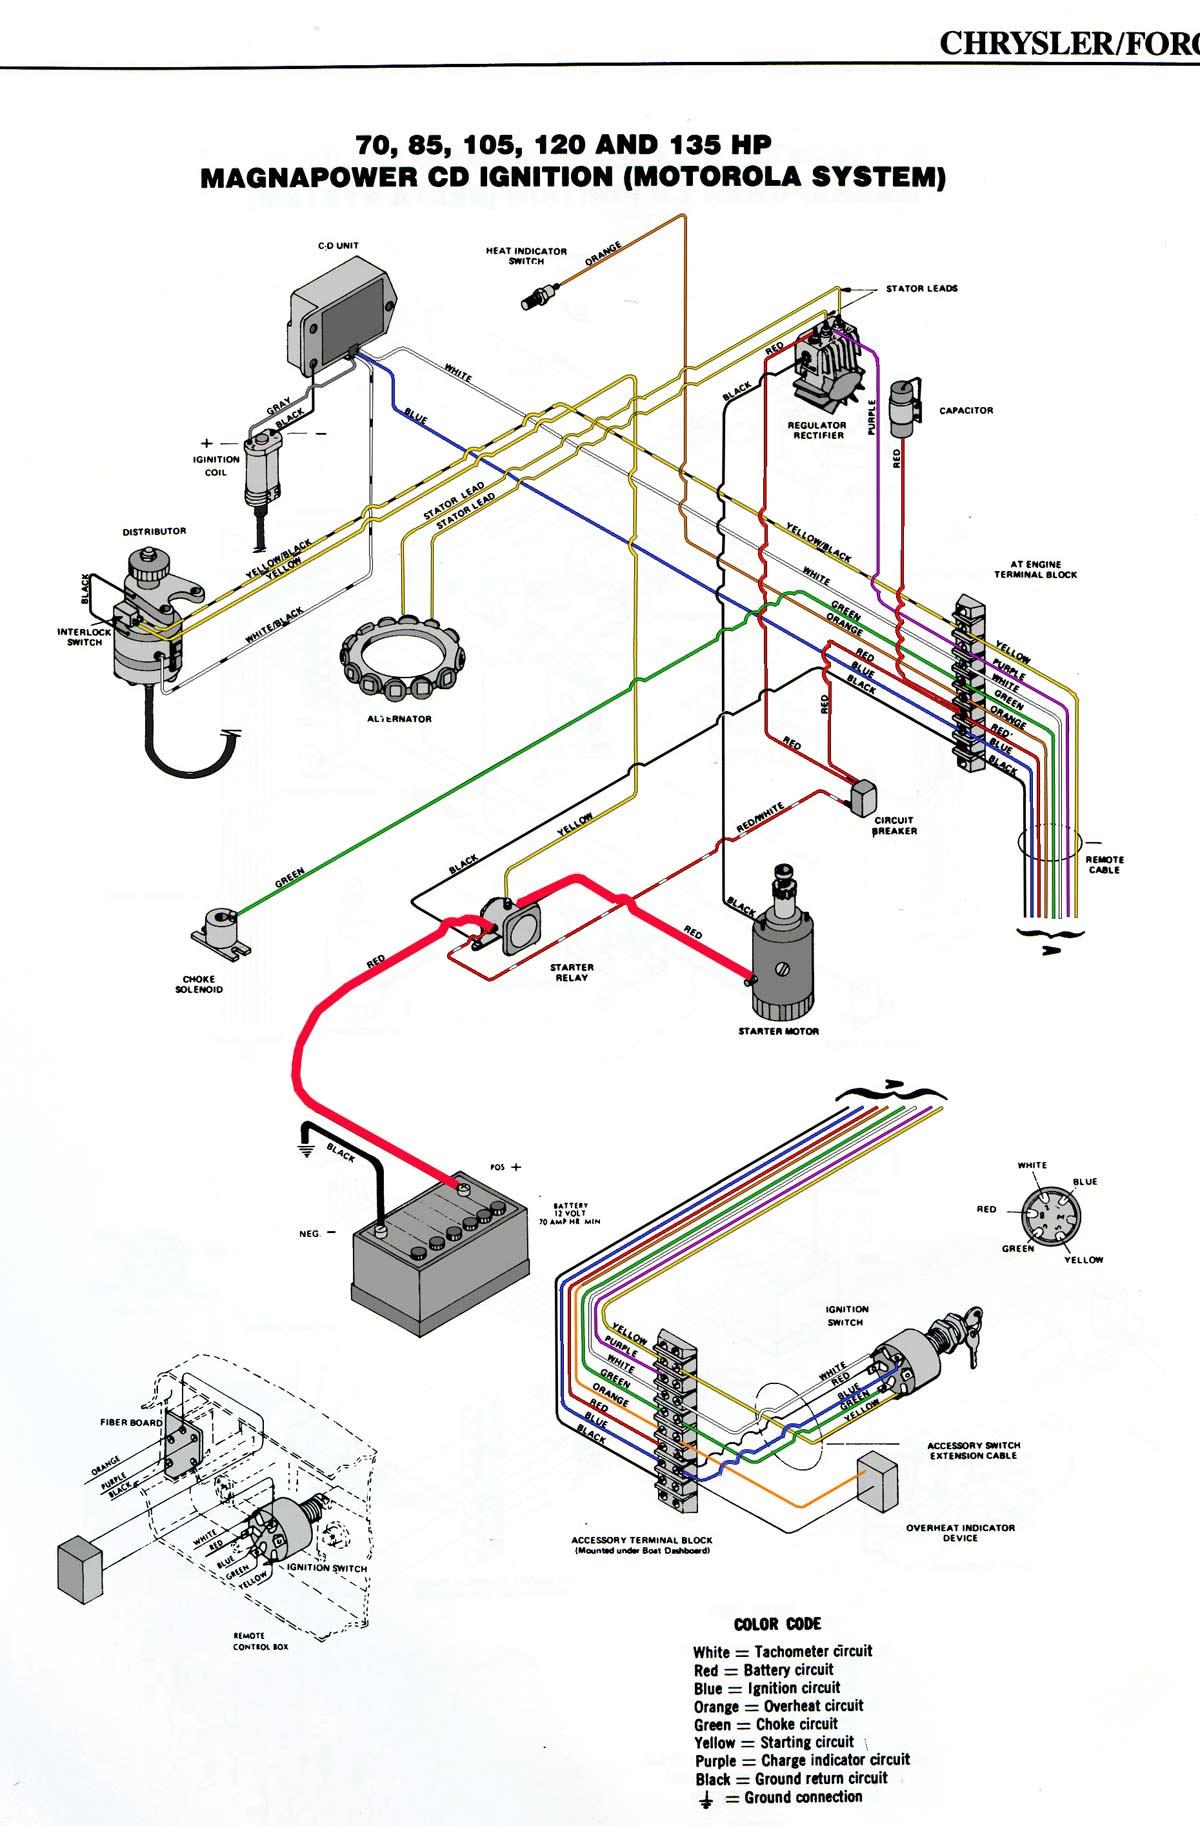 mercruiser 140 hp 4 cylinder wiring diagram free picture hp free printable wiring diagrams